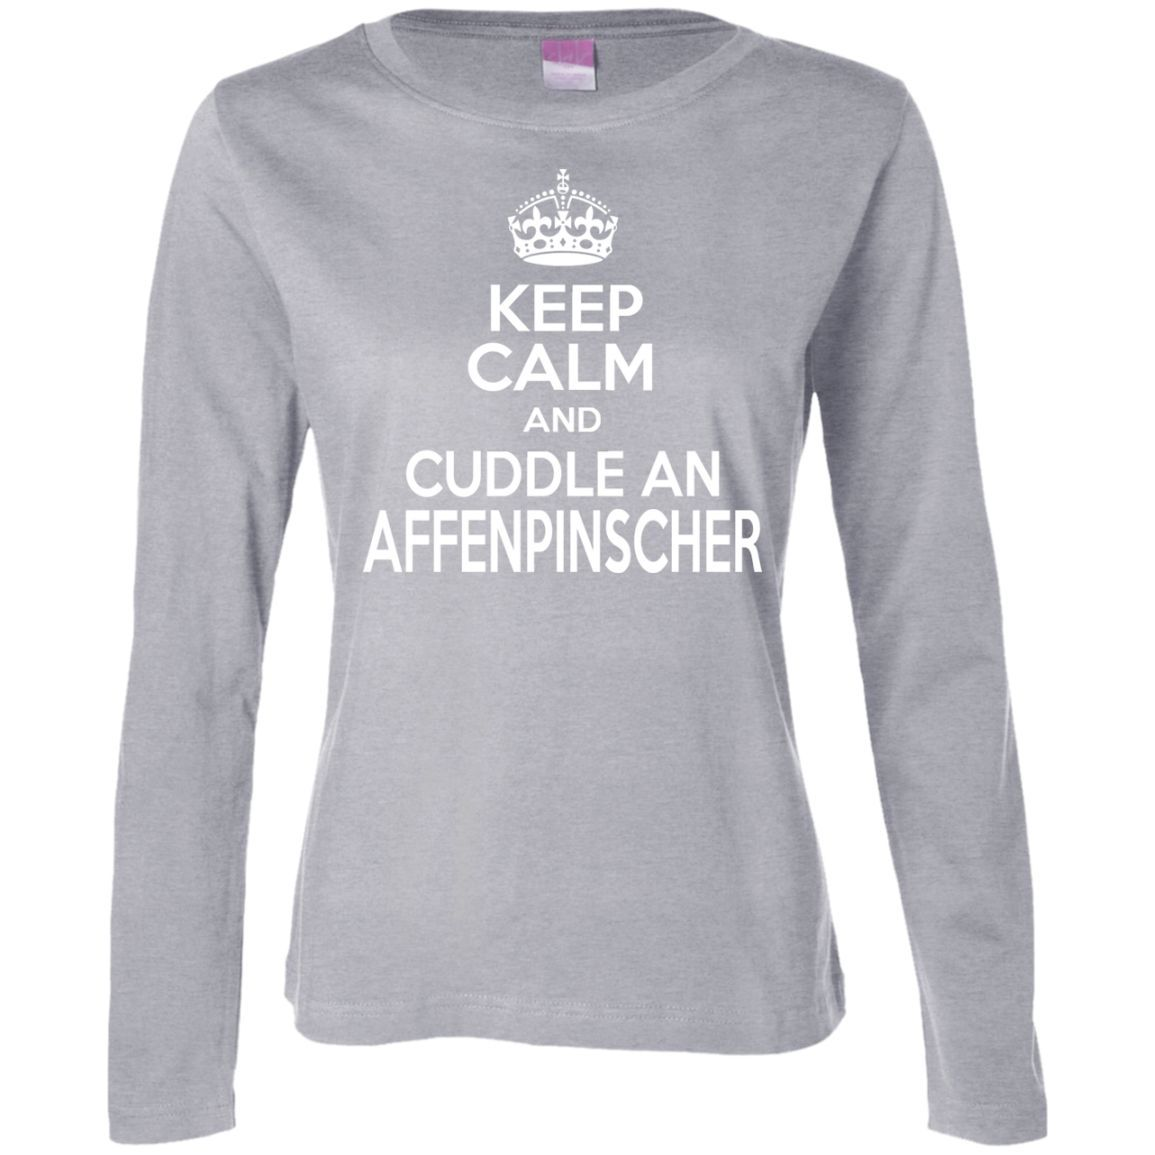 Keep Calm And Cuddle An Affenpinscher Ladies Long Sleeve Tees